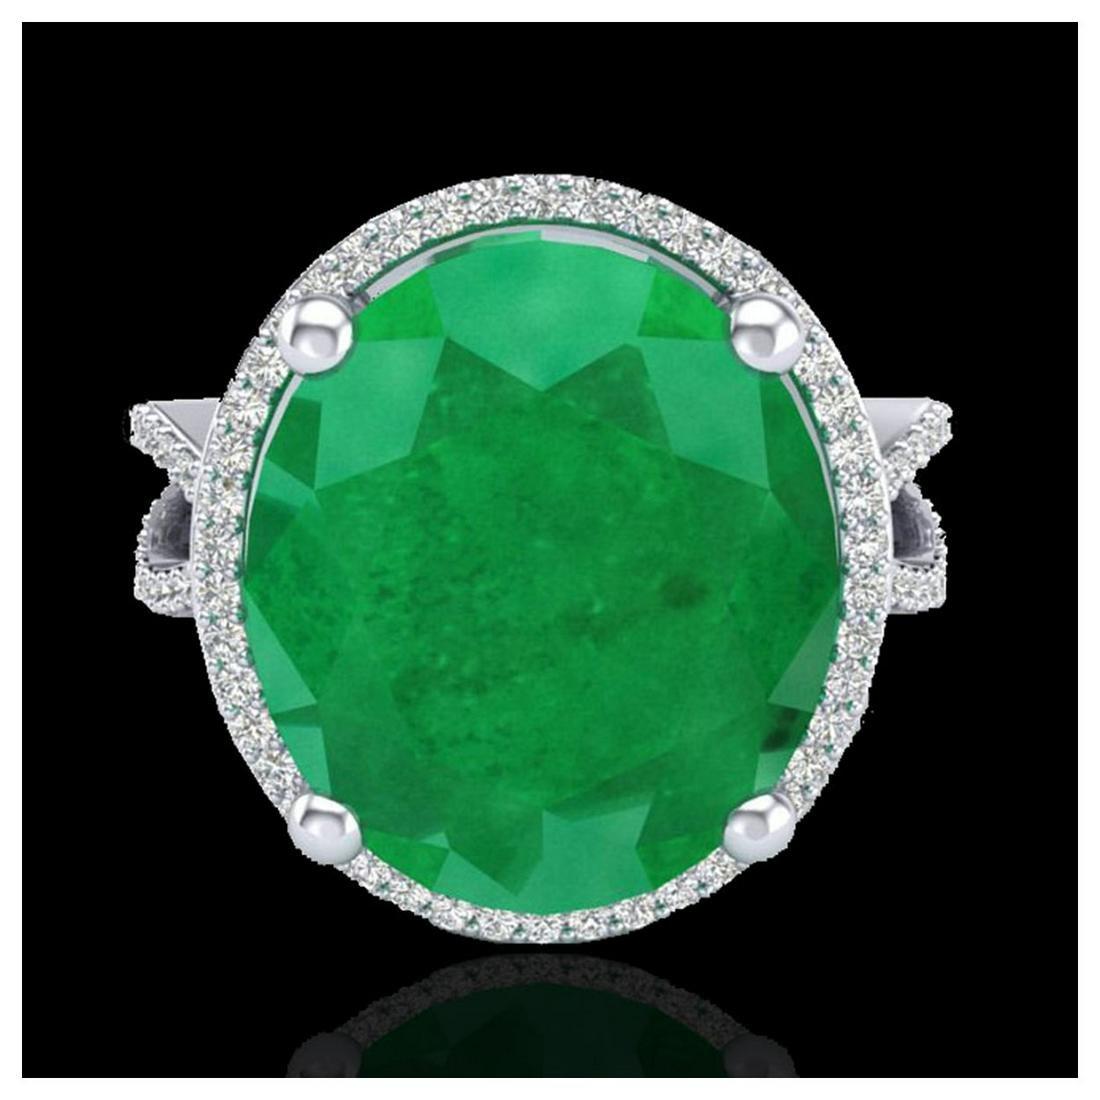 12 ctw Emerald & VS/SI Diamond Ring 18K White Gold -